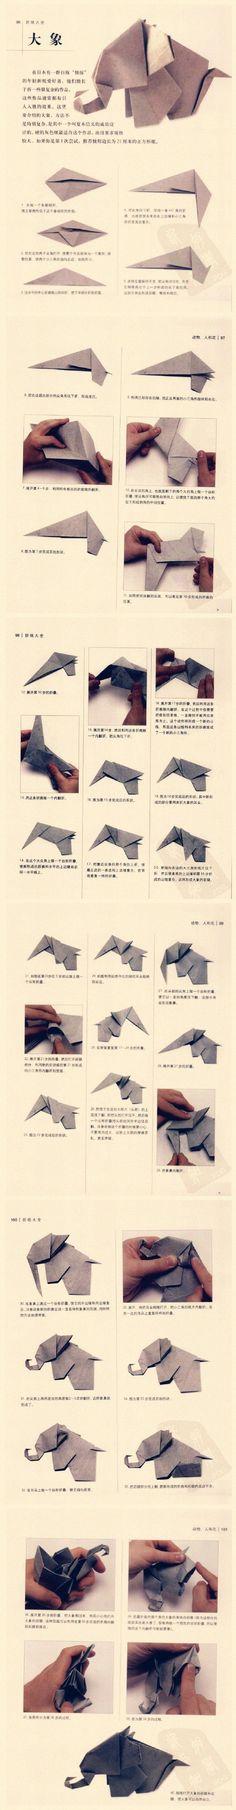 origami elephant-love this elephant, wish instructions were translated into English. – Origami World Origami Tutorial, Instruções Origami, Origami And Kirigami, Origami Paper Art, Oragami, Origami Instructions, Diy Paper, Paper Crafts, Origami Bookmark